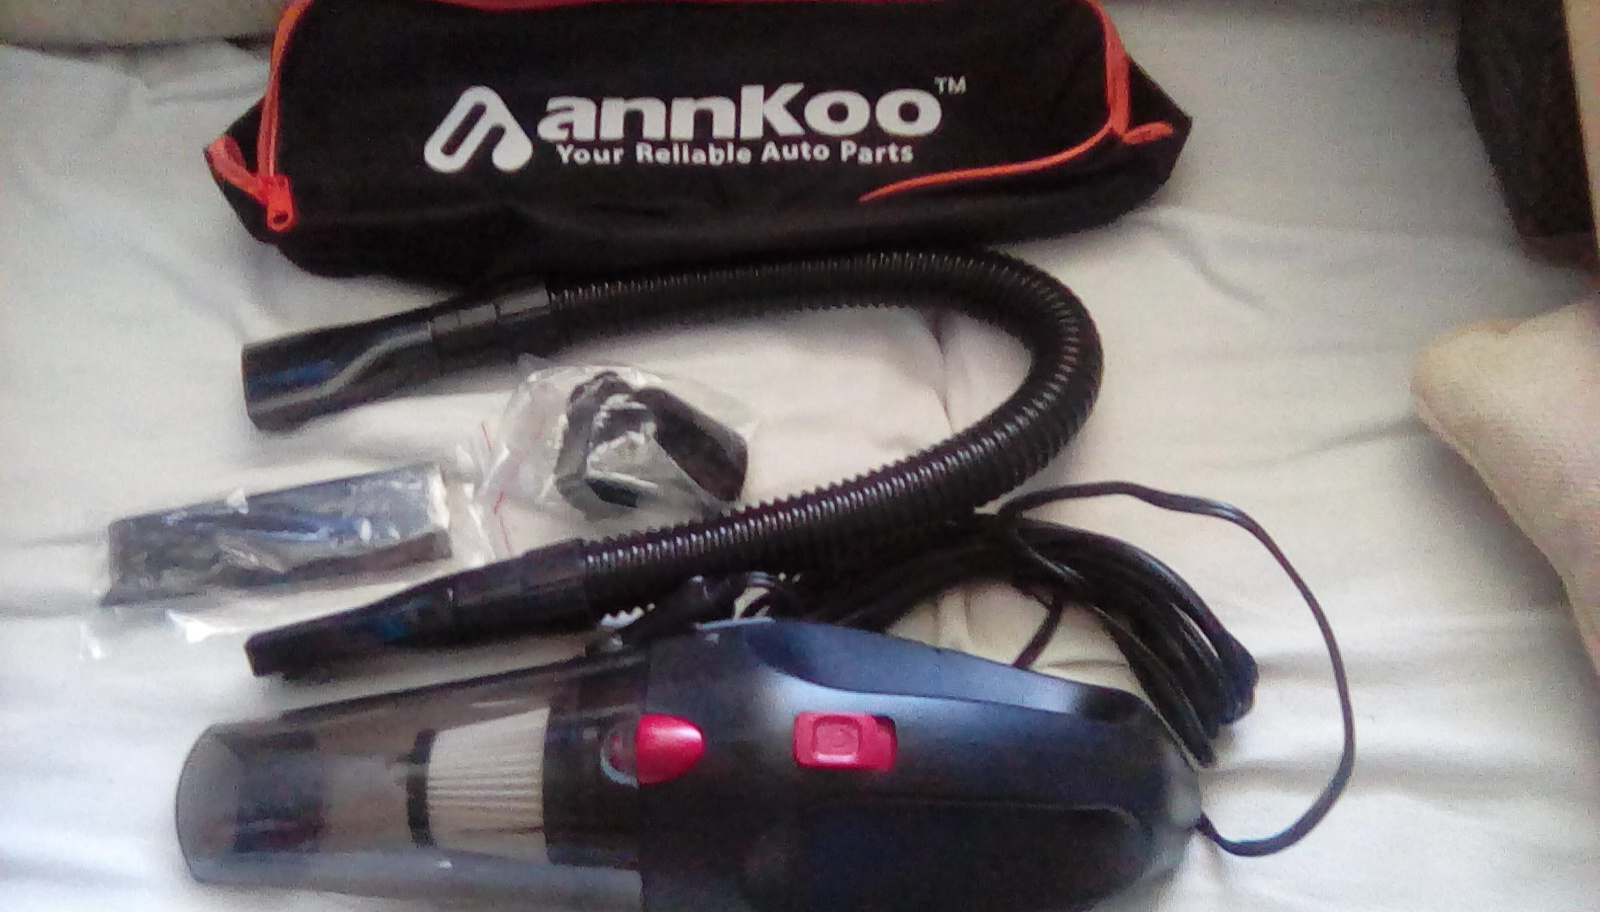 The perfect car Vacuum cleaner